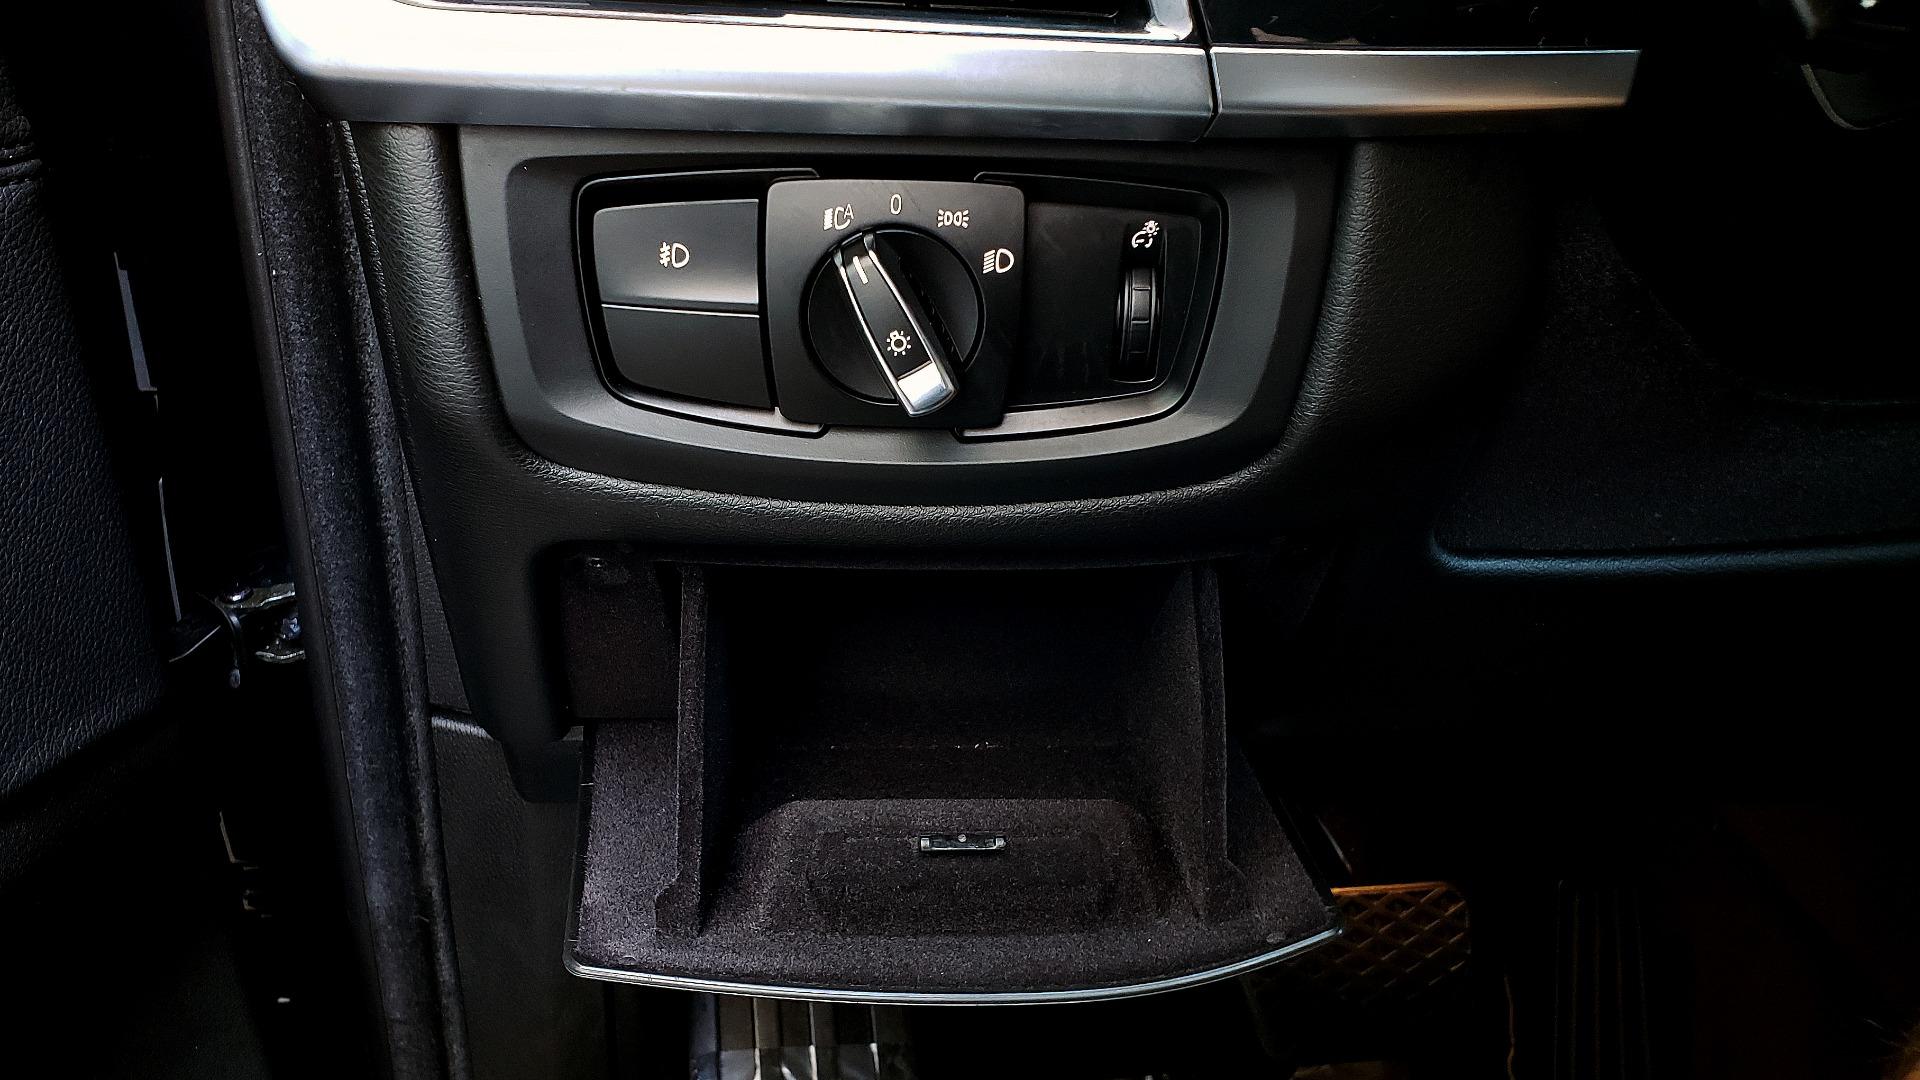 Used 2016 BMW X5 XDRIVE35I / PREM PKG / NAV / DRVR ASST PLUS / REARVIEW for sale $25,765 at Formula Imports in Charlotte NC 28227 27